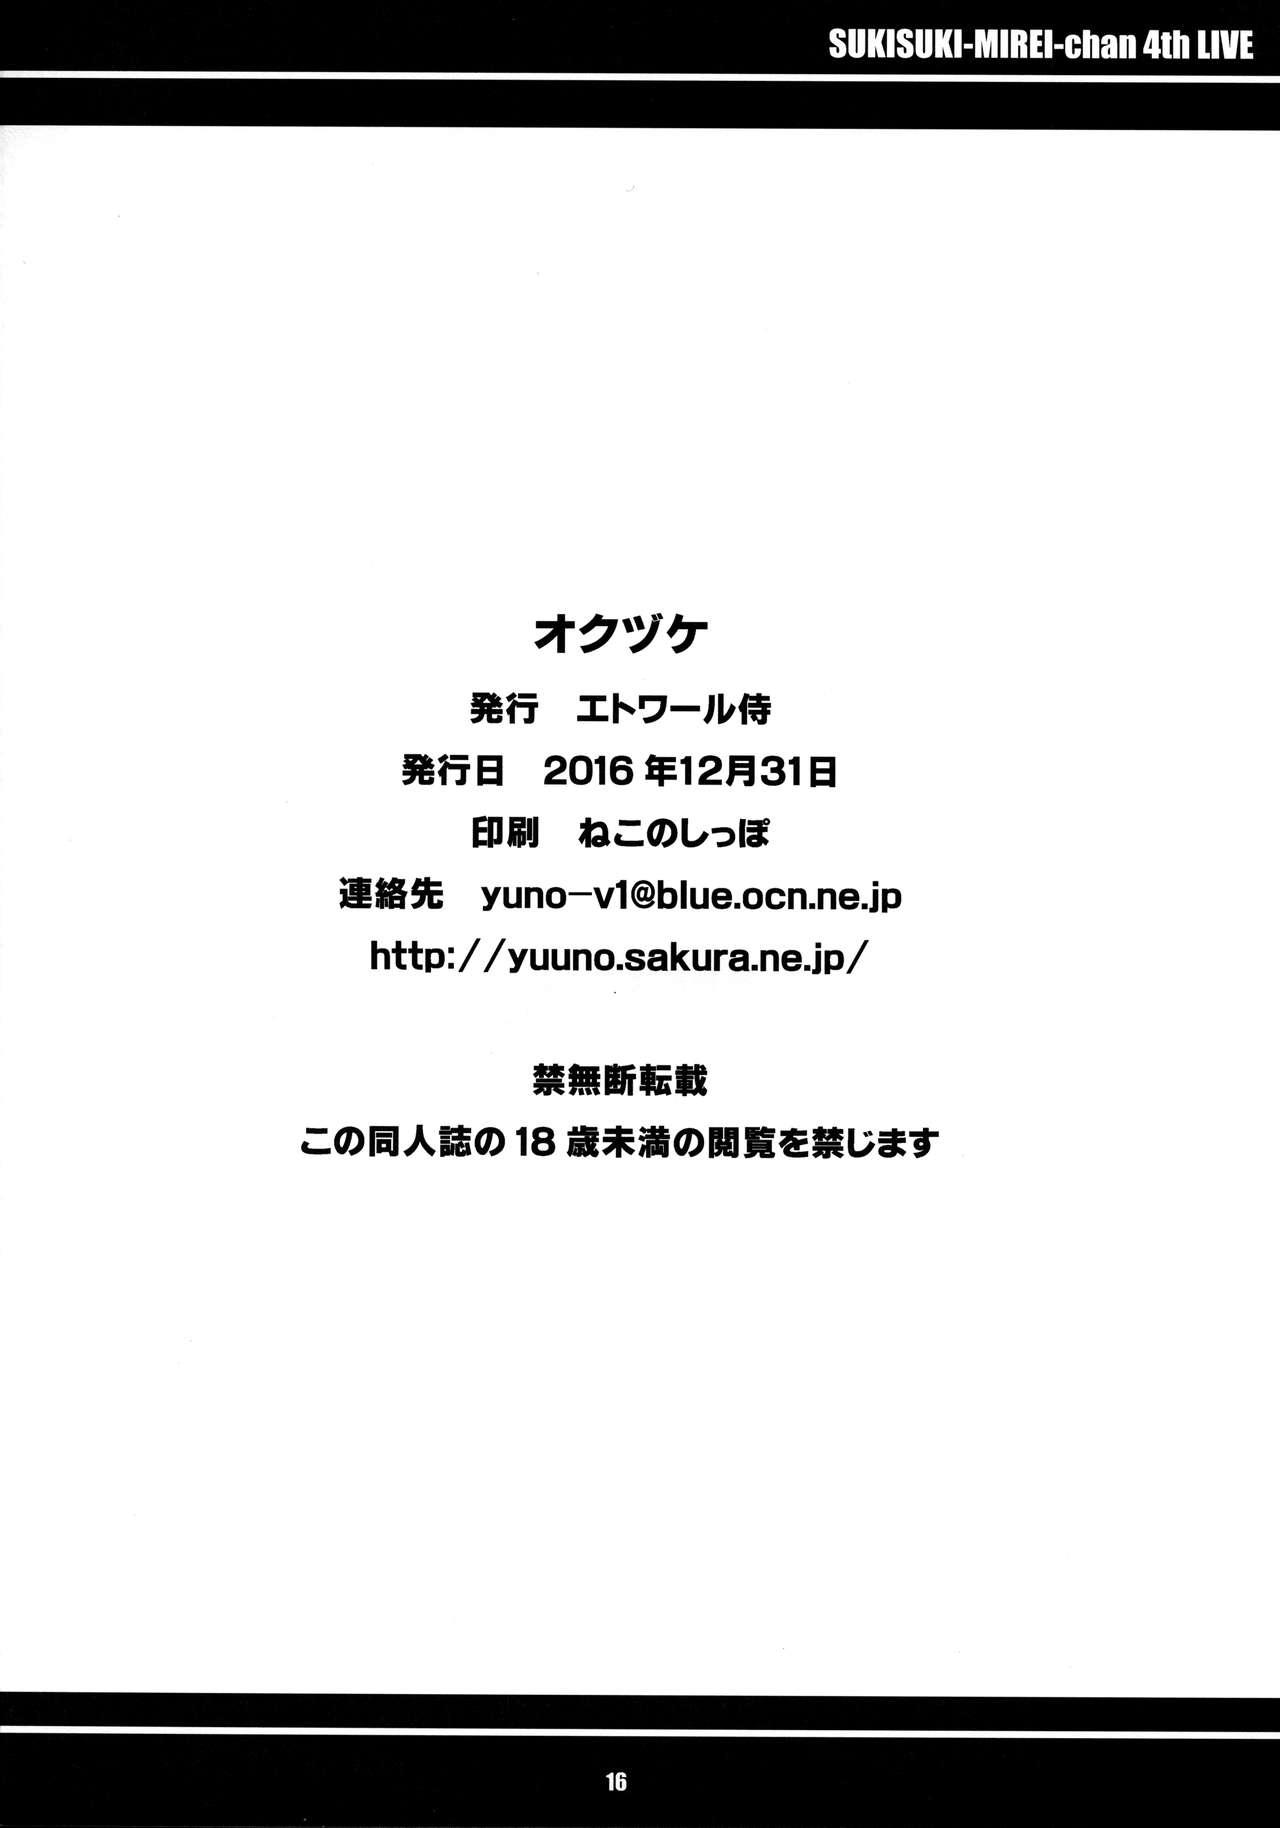 Suki Suki Mirei-chan 4th LIVE 16